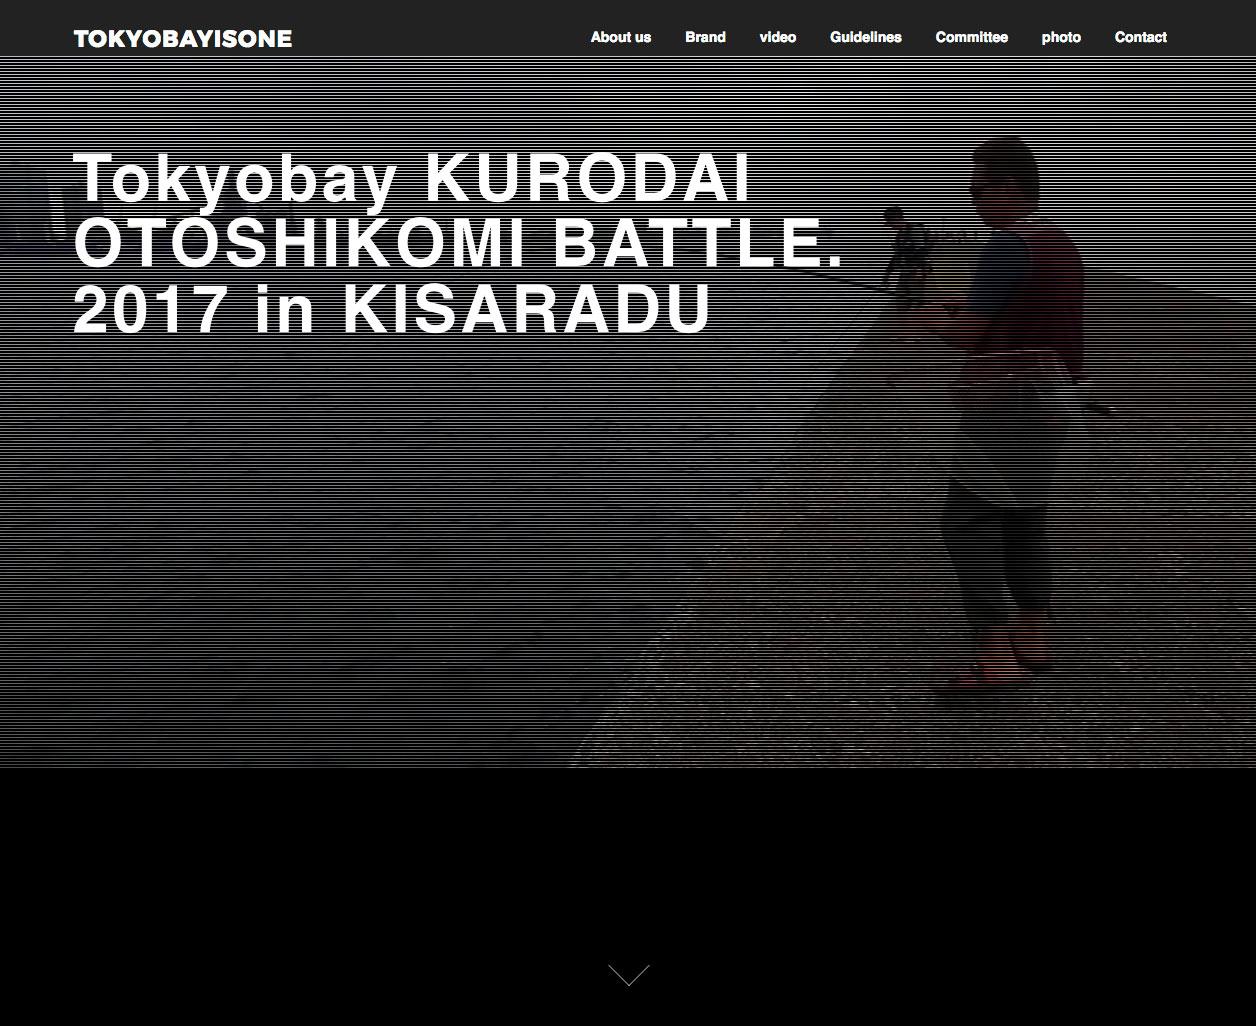 tokyobayisad2017:今年もやる!